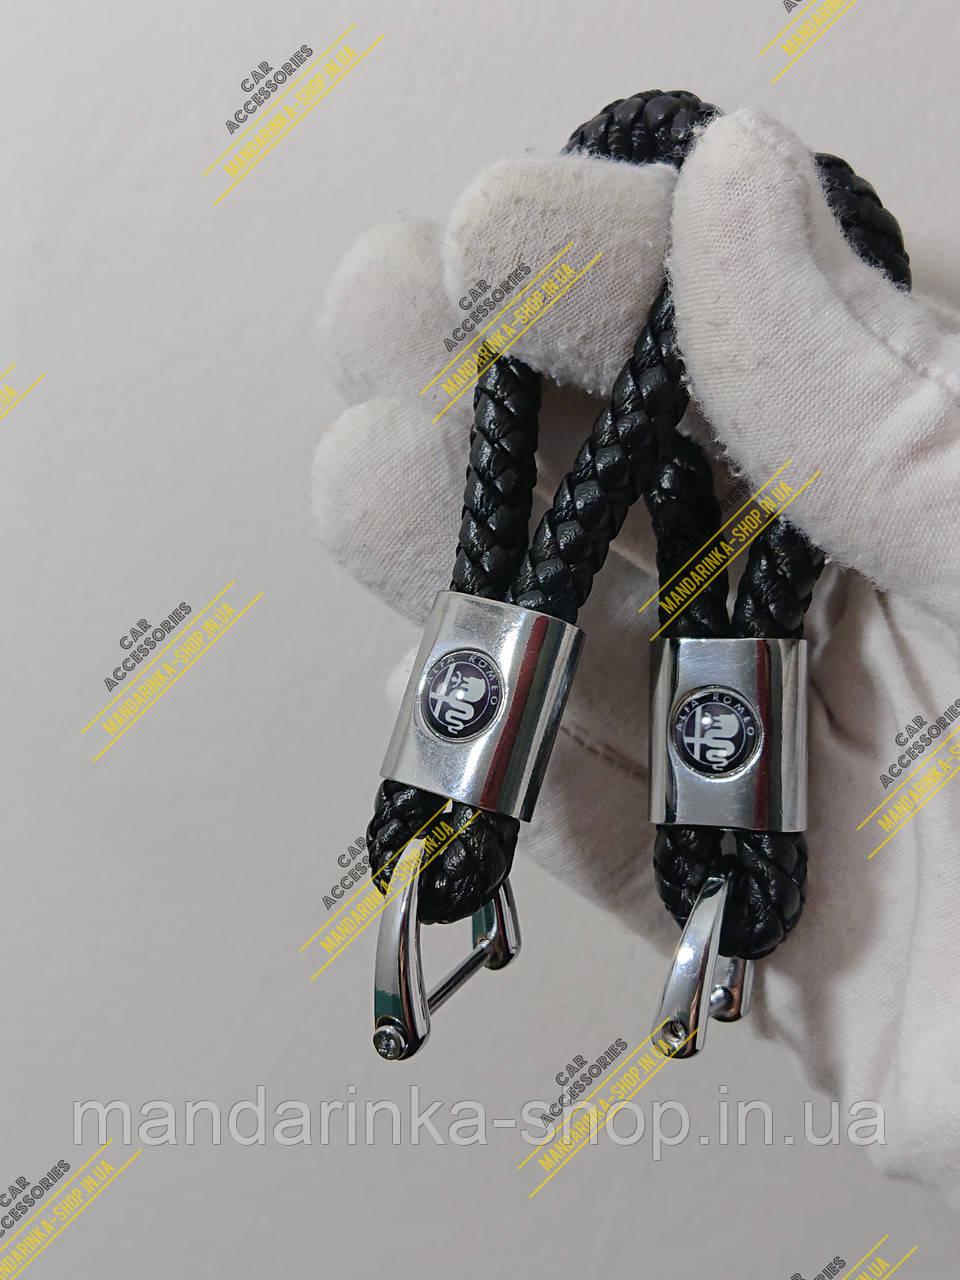 Брелок для автомобильных ключей Aston Martin (Астон Мартин)